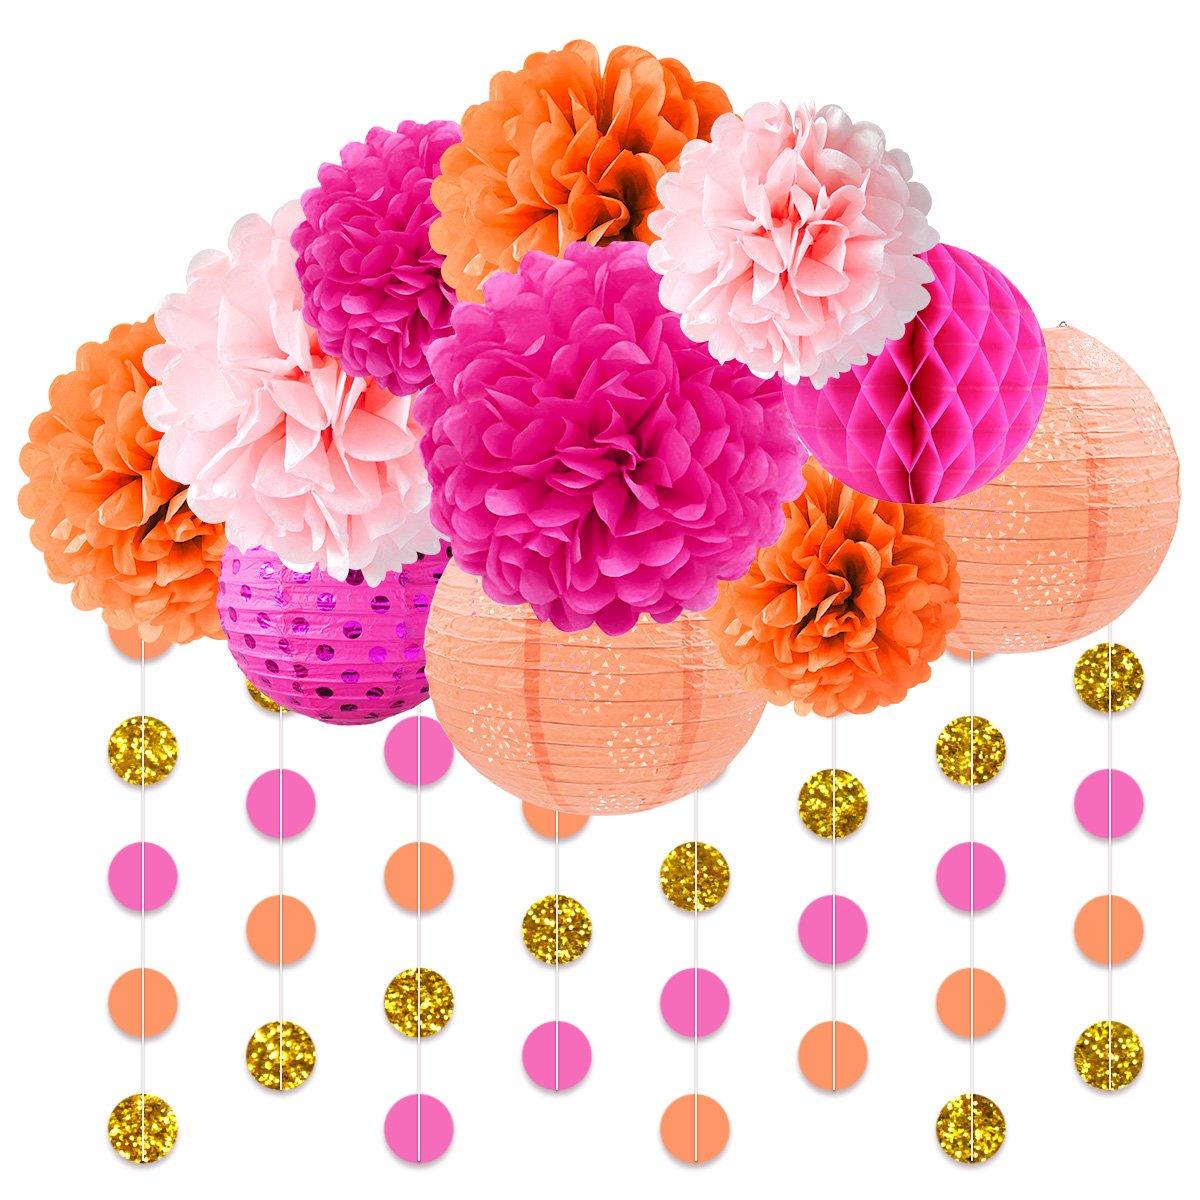 NICROLANDEE Pink and Orange Birthday Party Decoration Pack Paper Lanterns Tissue Flower Poms Gold Glitter Garland for Flamingo Bachelorette Birthday Baby Shower Thanksgiving Fiesta Festival Decor by NICROLANDEE (Image #1)